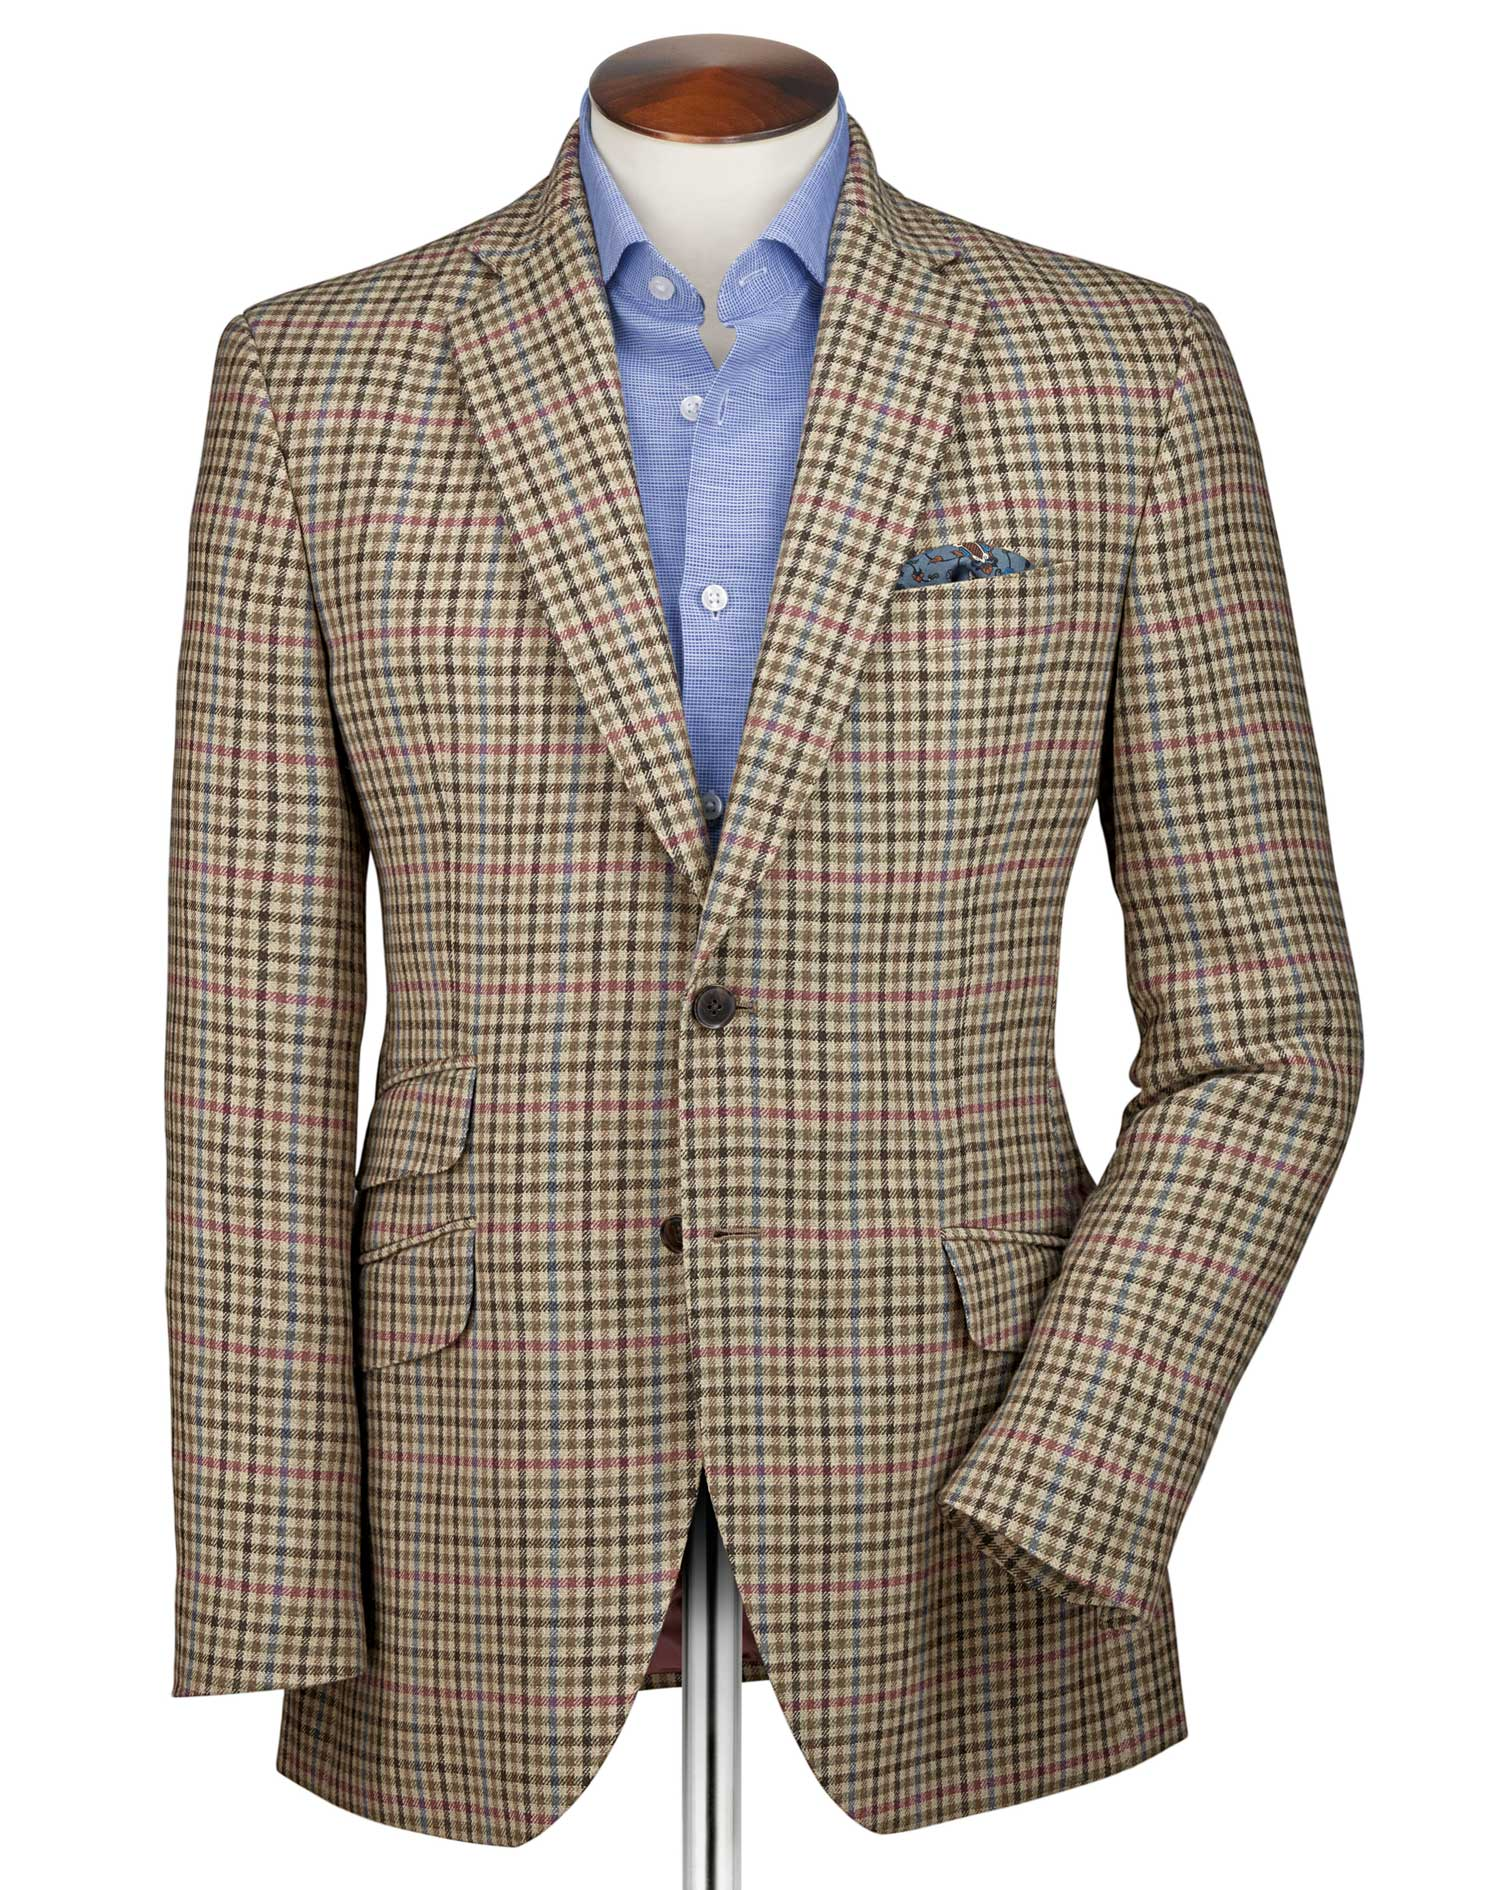 Slim Fit Beige Checkered Luxury Border Tweed Wool Jacket Size 38 Long by Charles Tyrwhitt